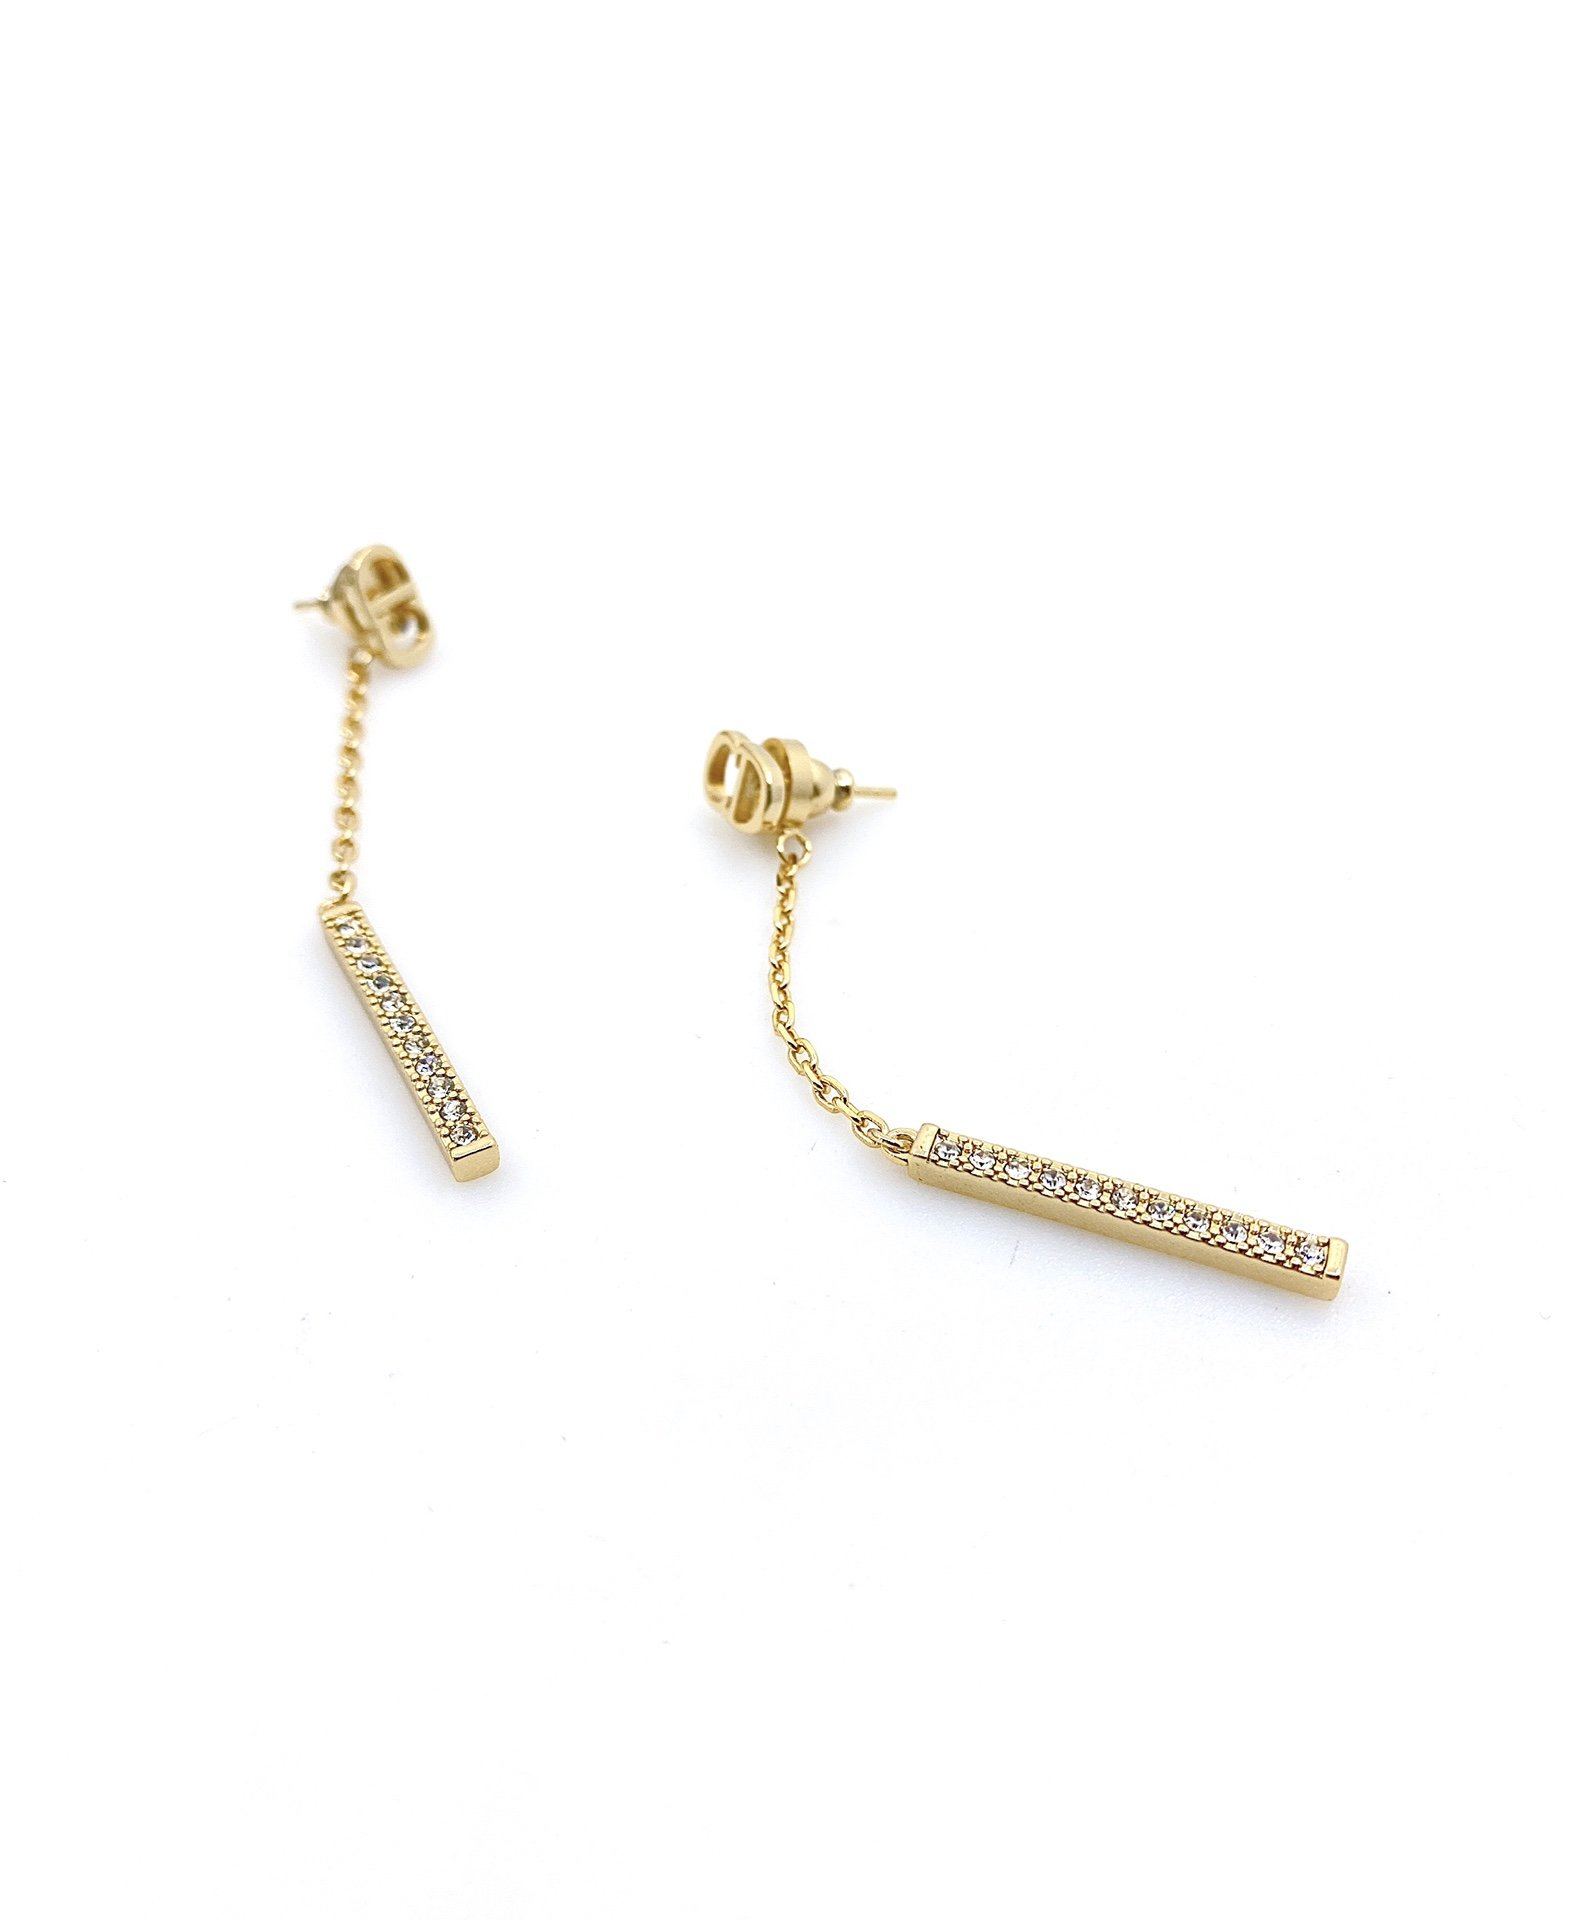 DiorCD线条耳钉非常简约时尚的一